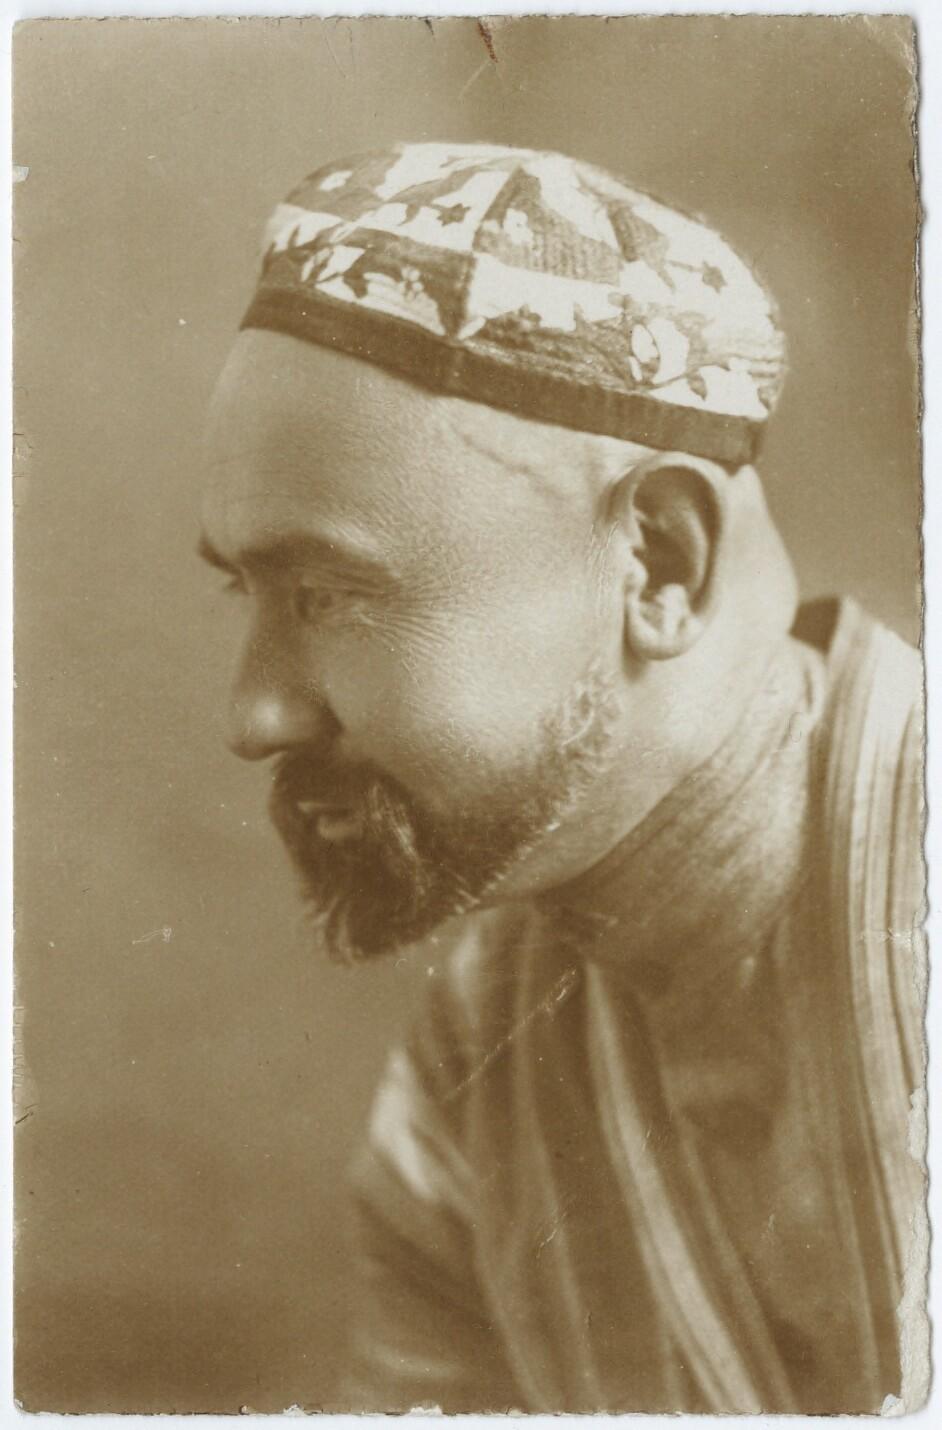 Achmedjean Aca Uzmozaif, player of reeds, Uzbek Musical Theatre, Soviet Central Asia